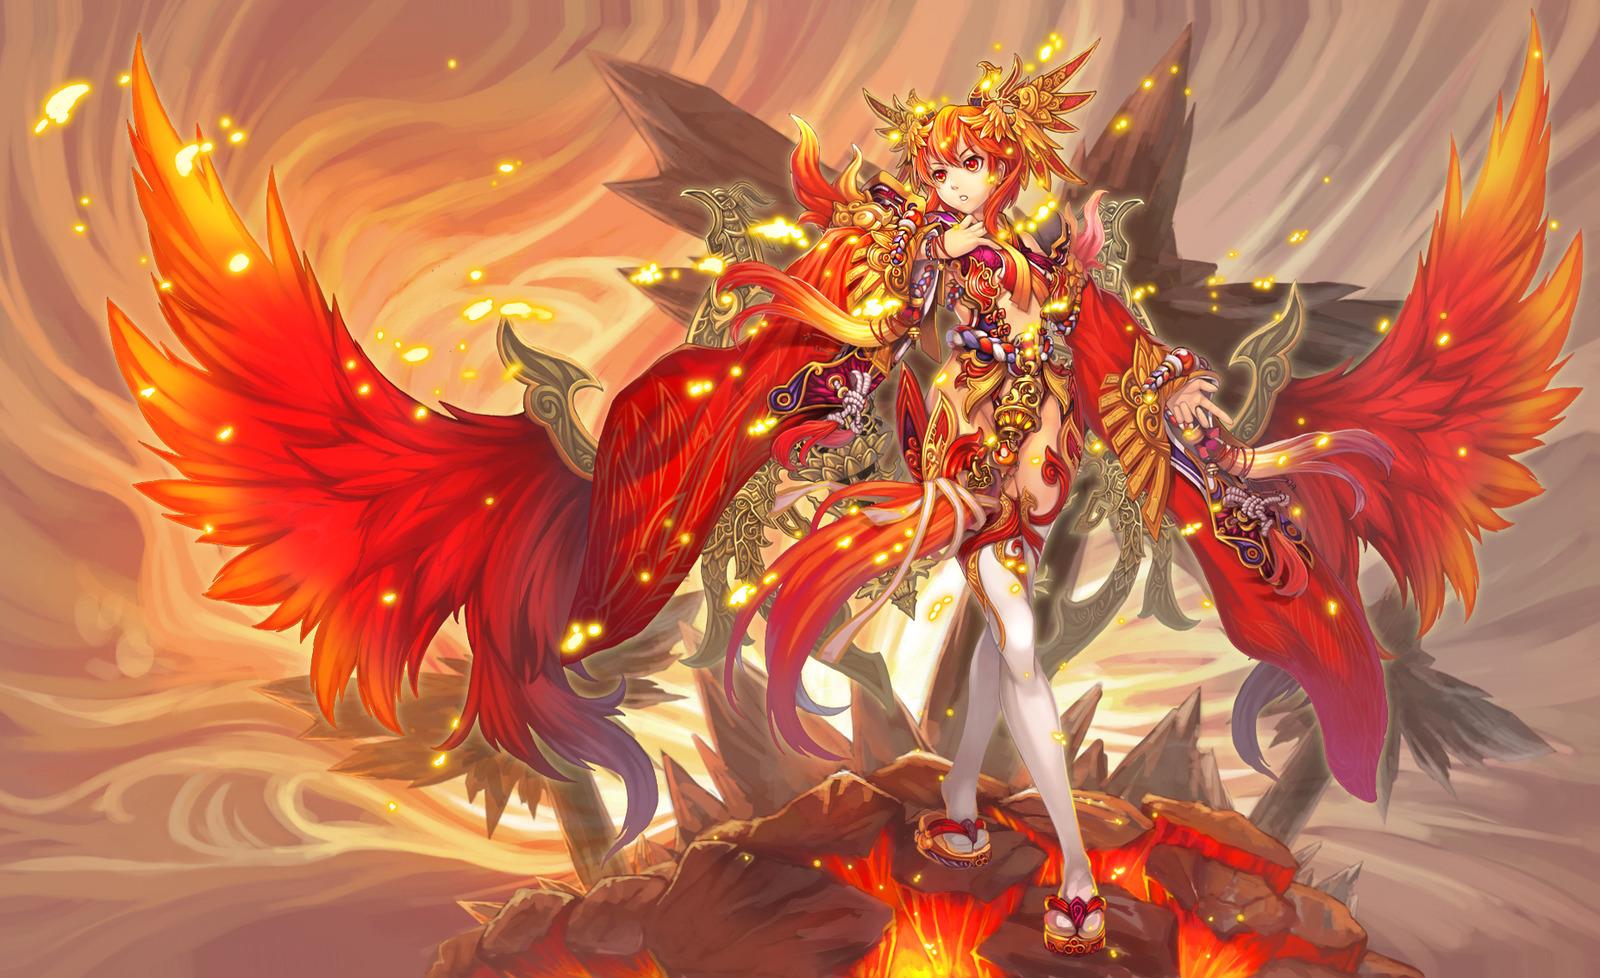 Image 1600x978 20173 Phoenix 2d Anime Phoenix Girl Woman Picture